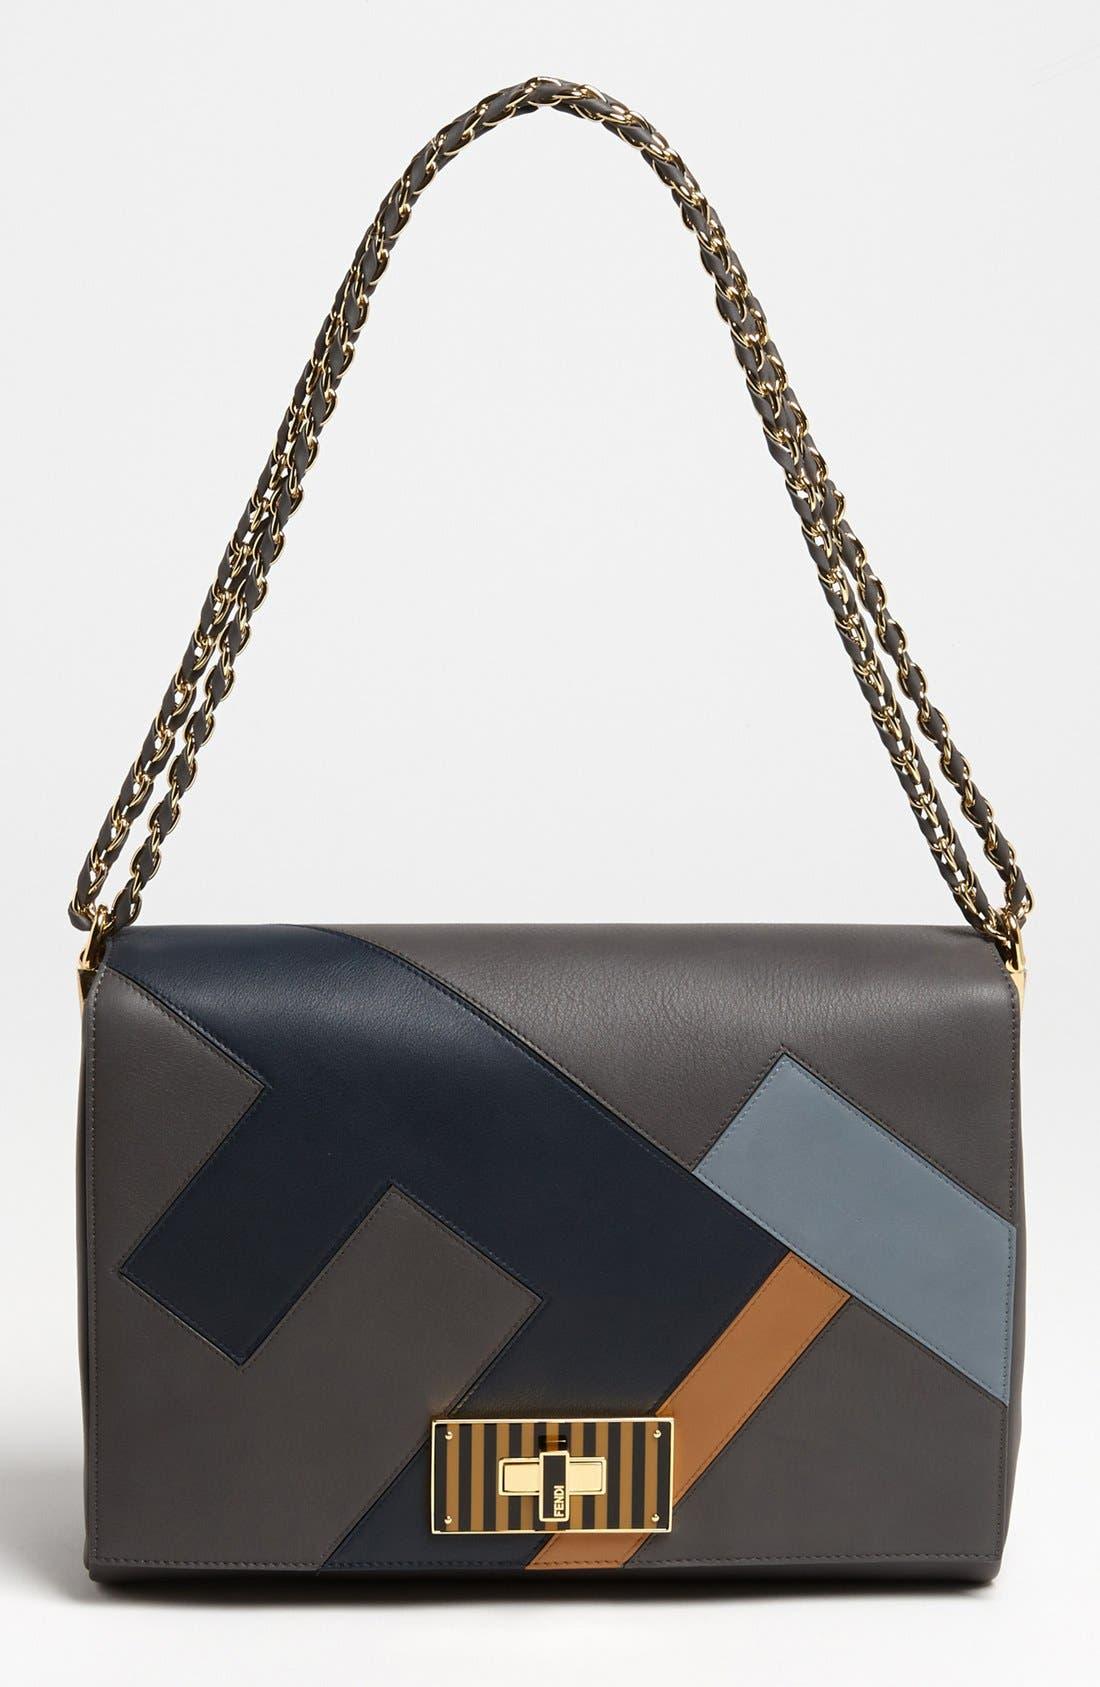 Main Image - Fendi 'Claudia - Medium' Leather Shoulder Bag